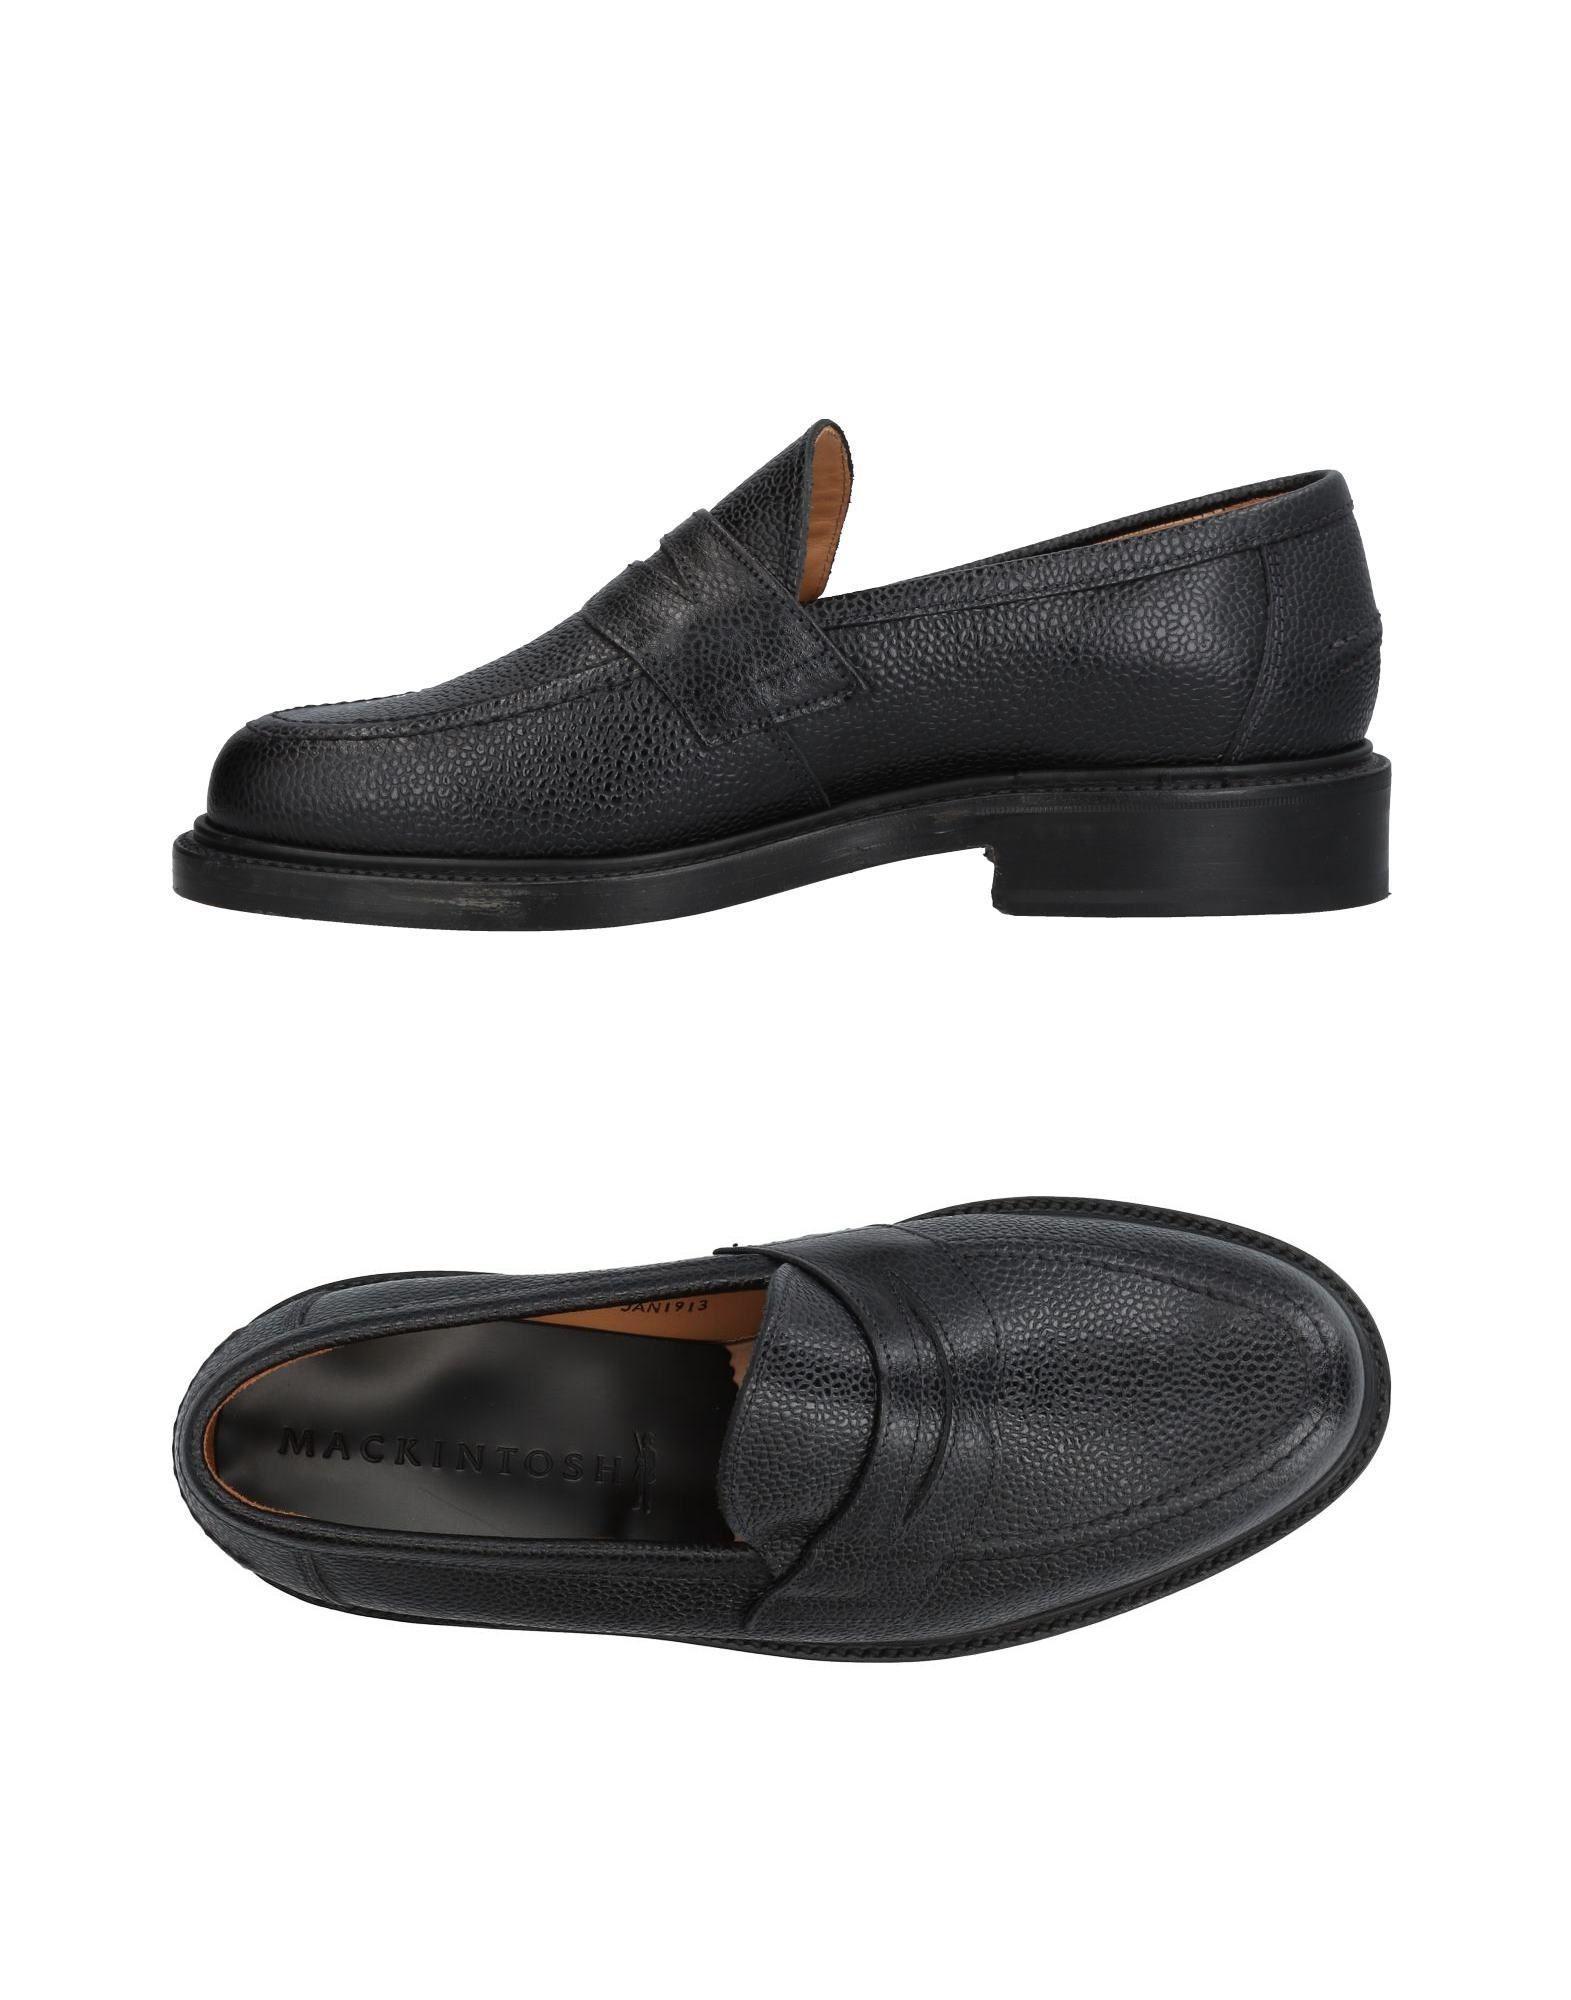 FOOTWEAR - Loafers on YOOX.COM HUGO BOSS qqnmiOS